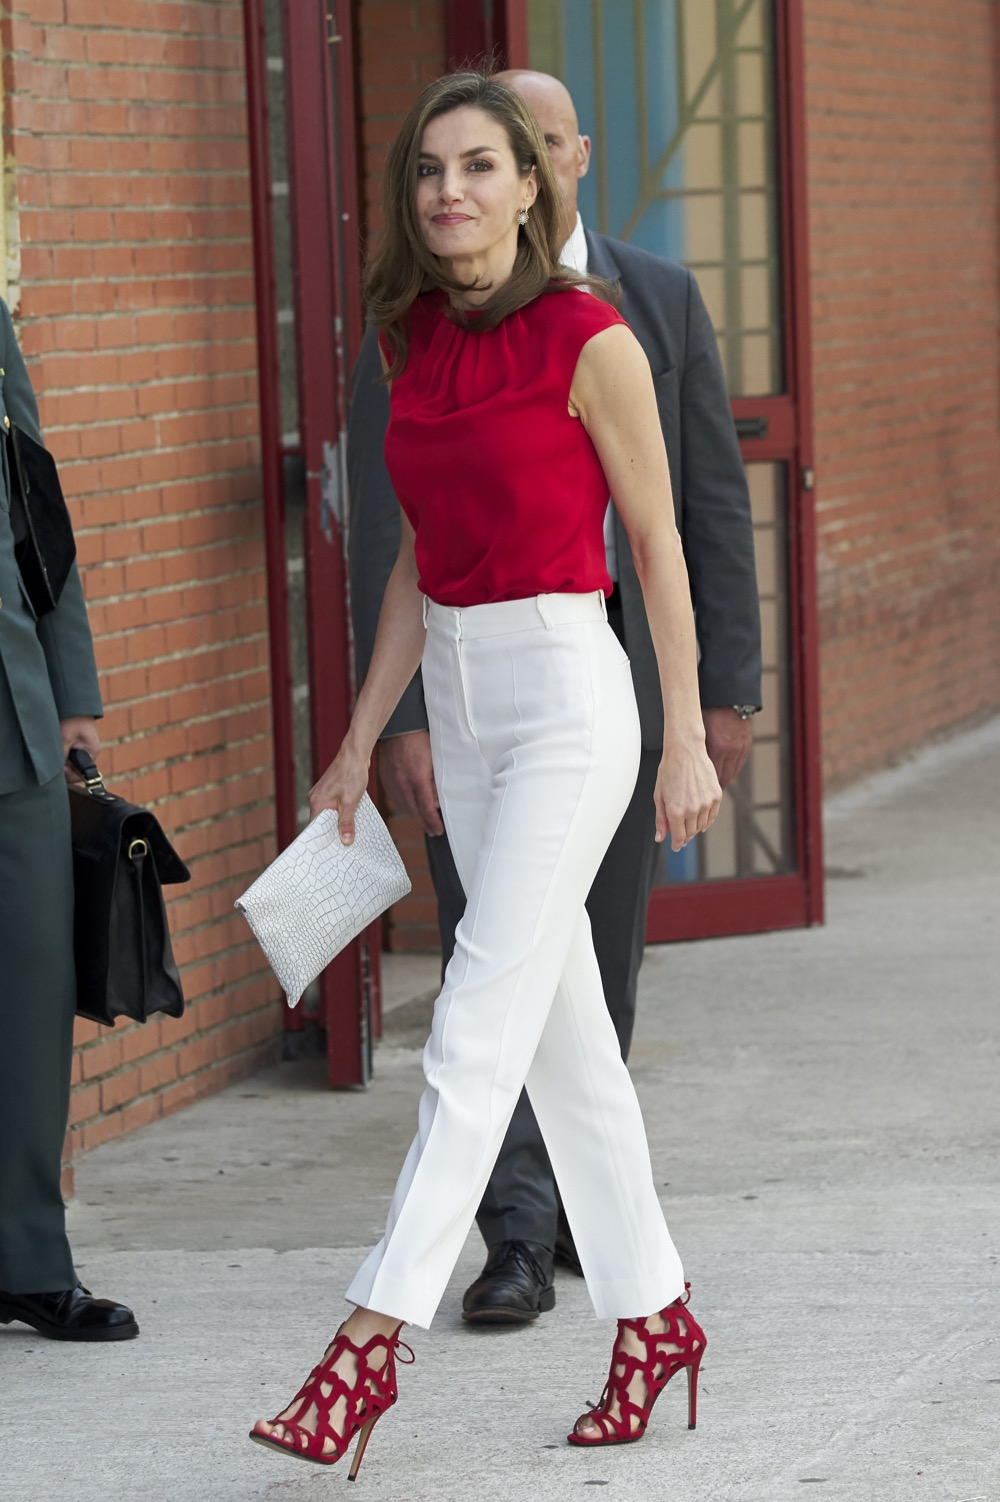 Queen Letizia of Spain Attends 'Toma La Palabra' In Asturias